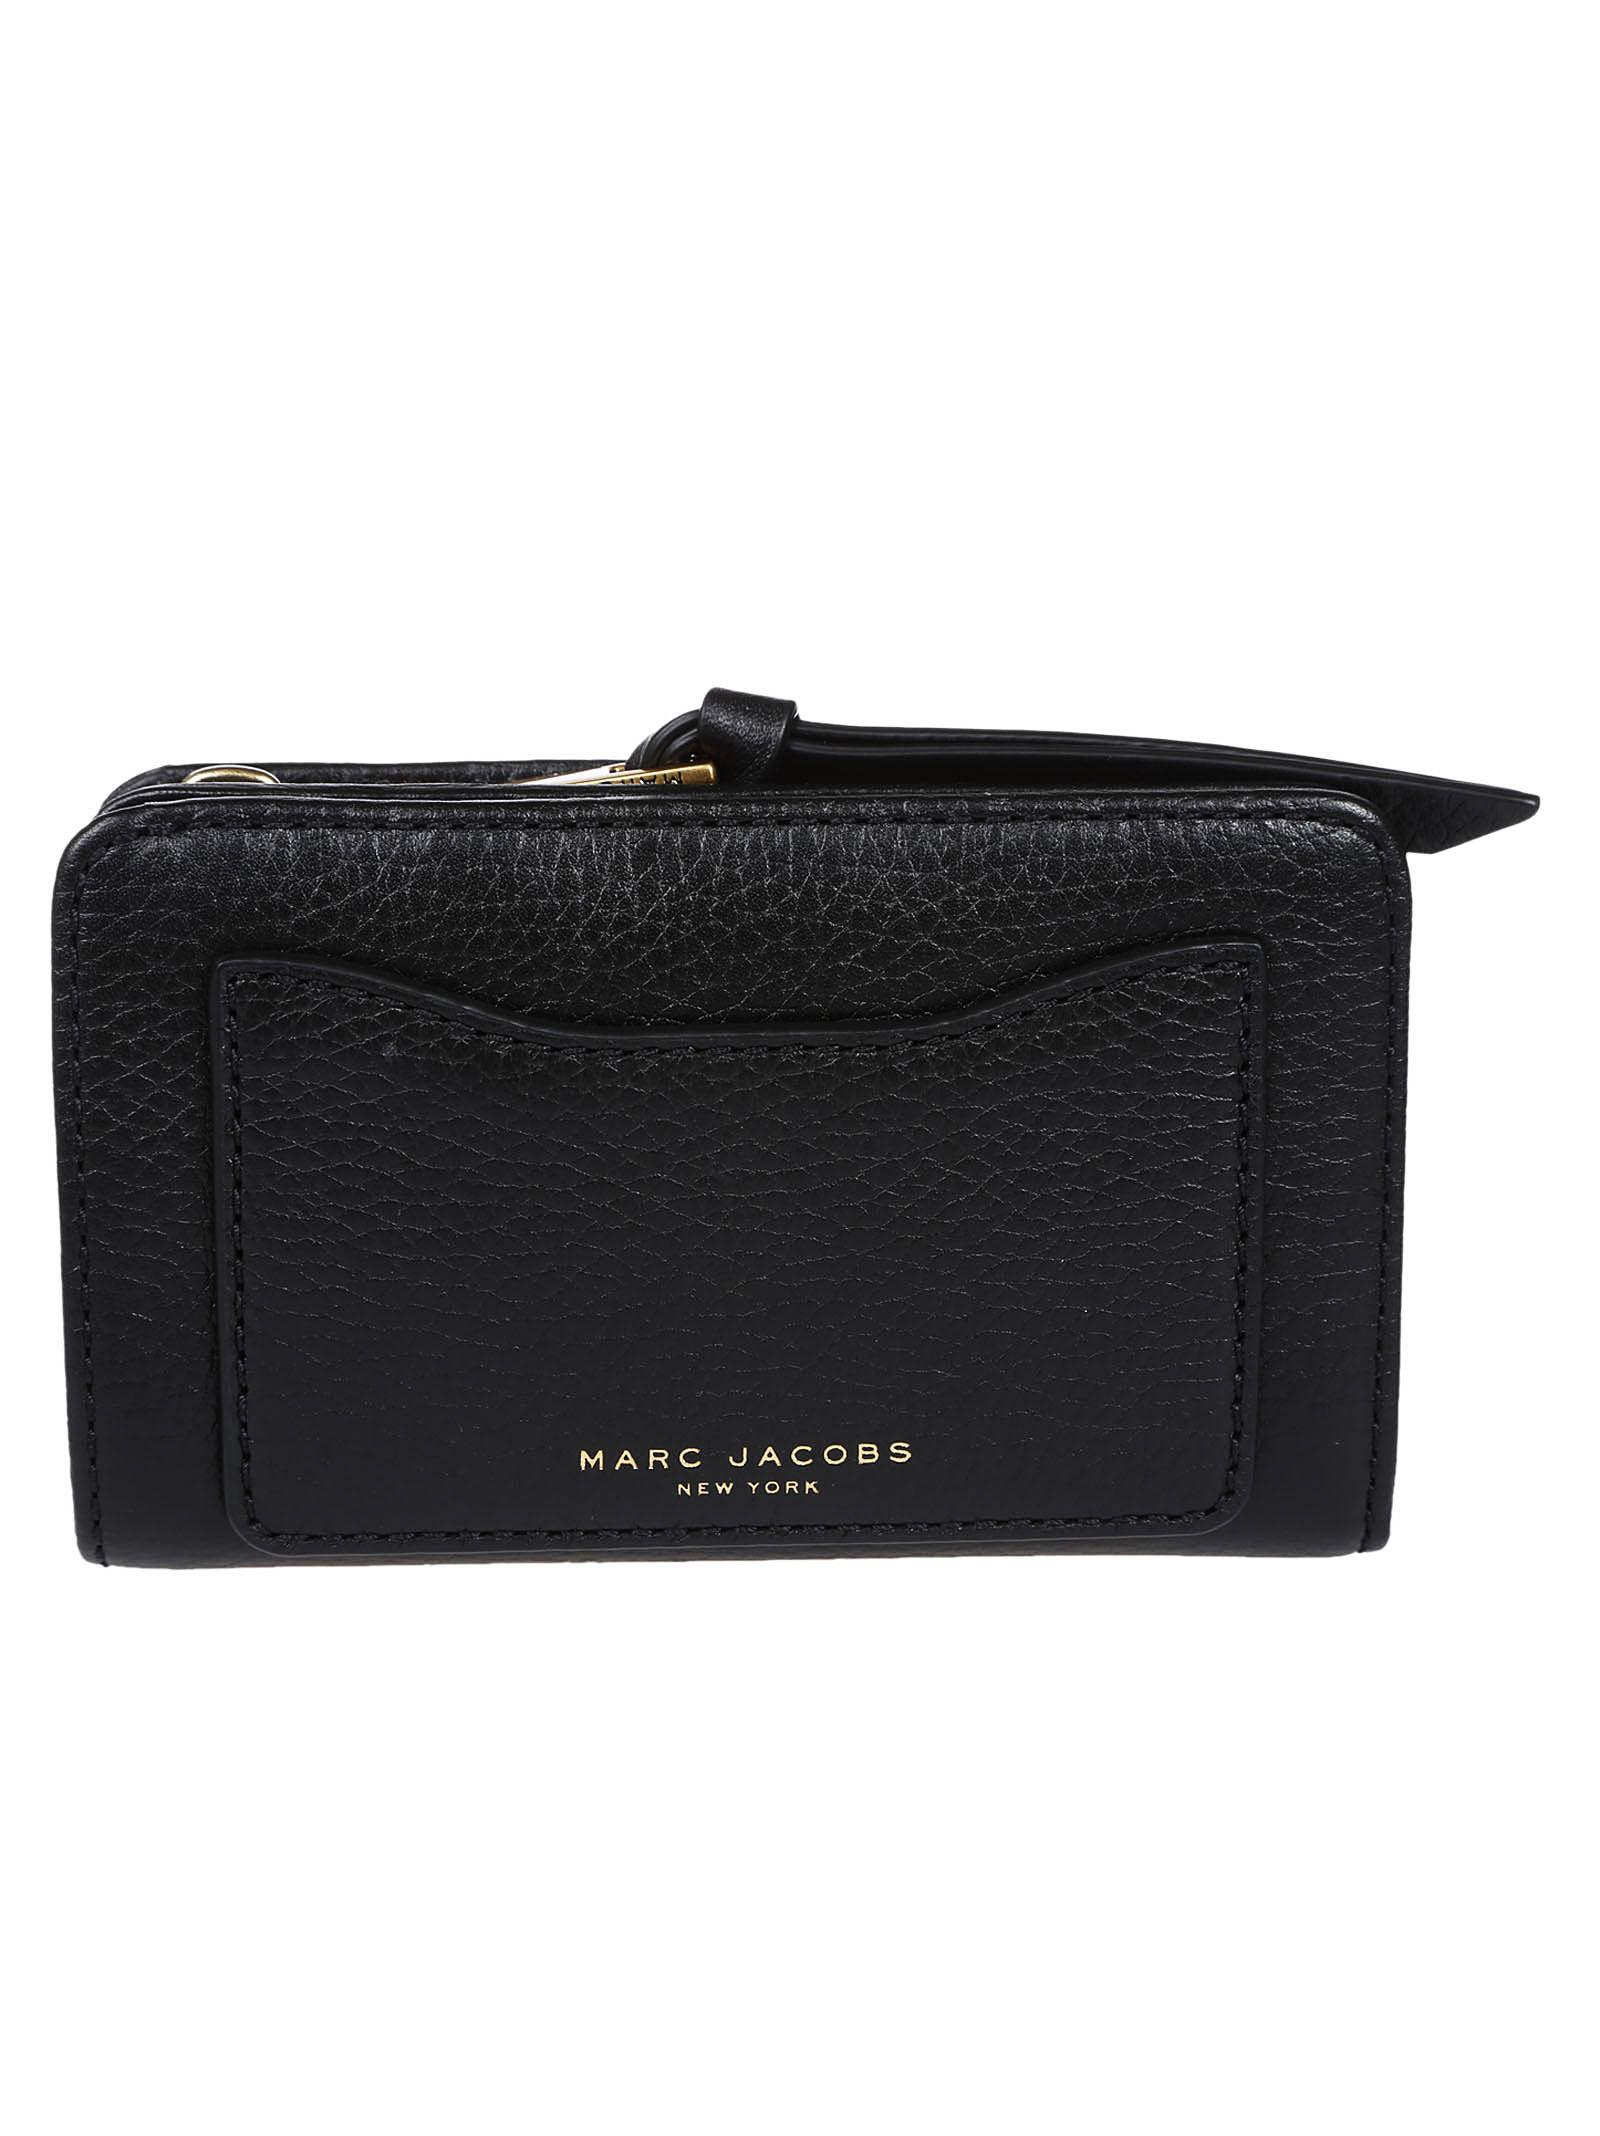 marc jacobs female marc jacobs recruit wallet